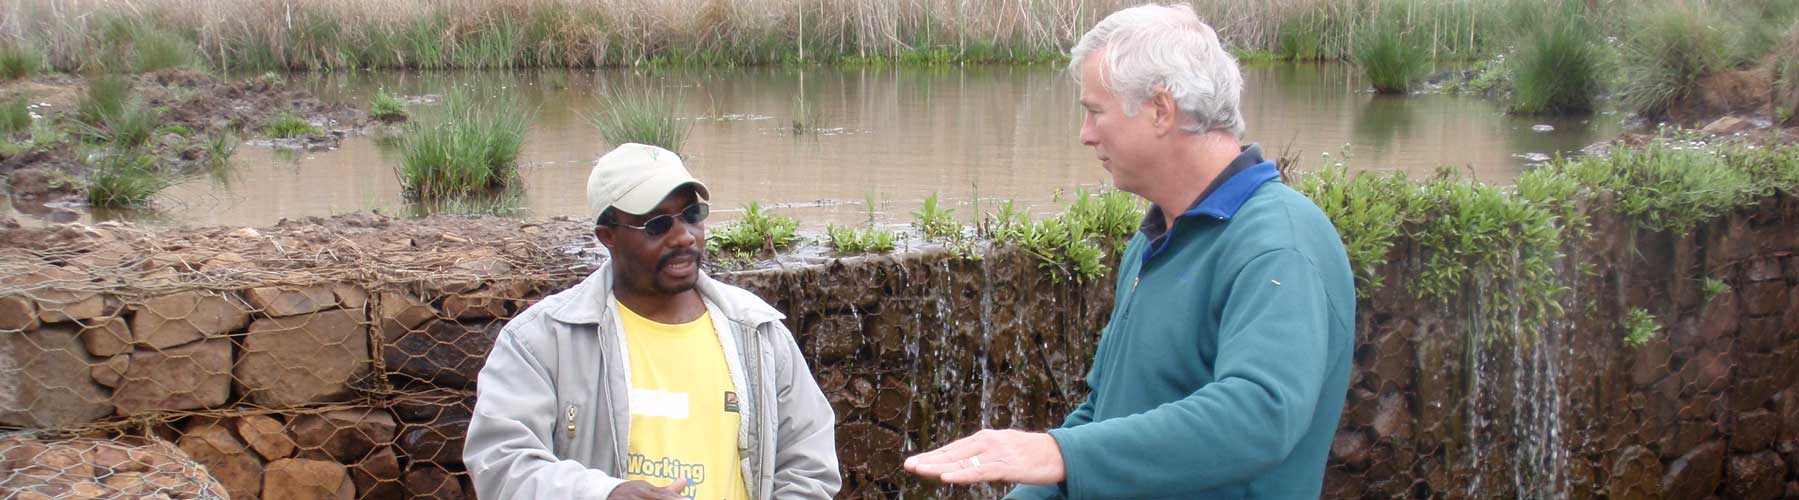 Memel.Global Water Conservation planning